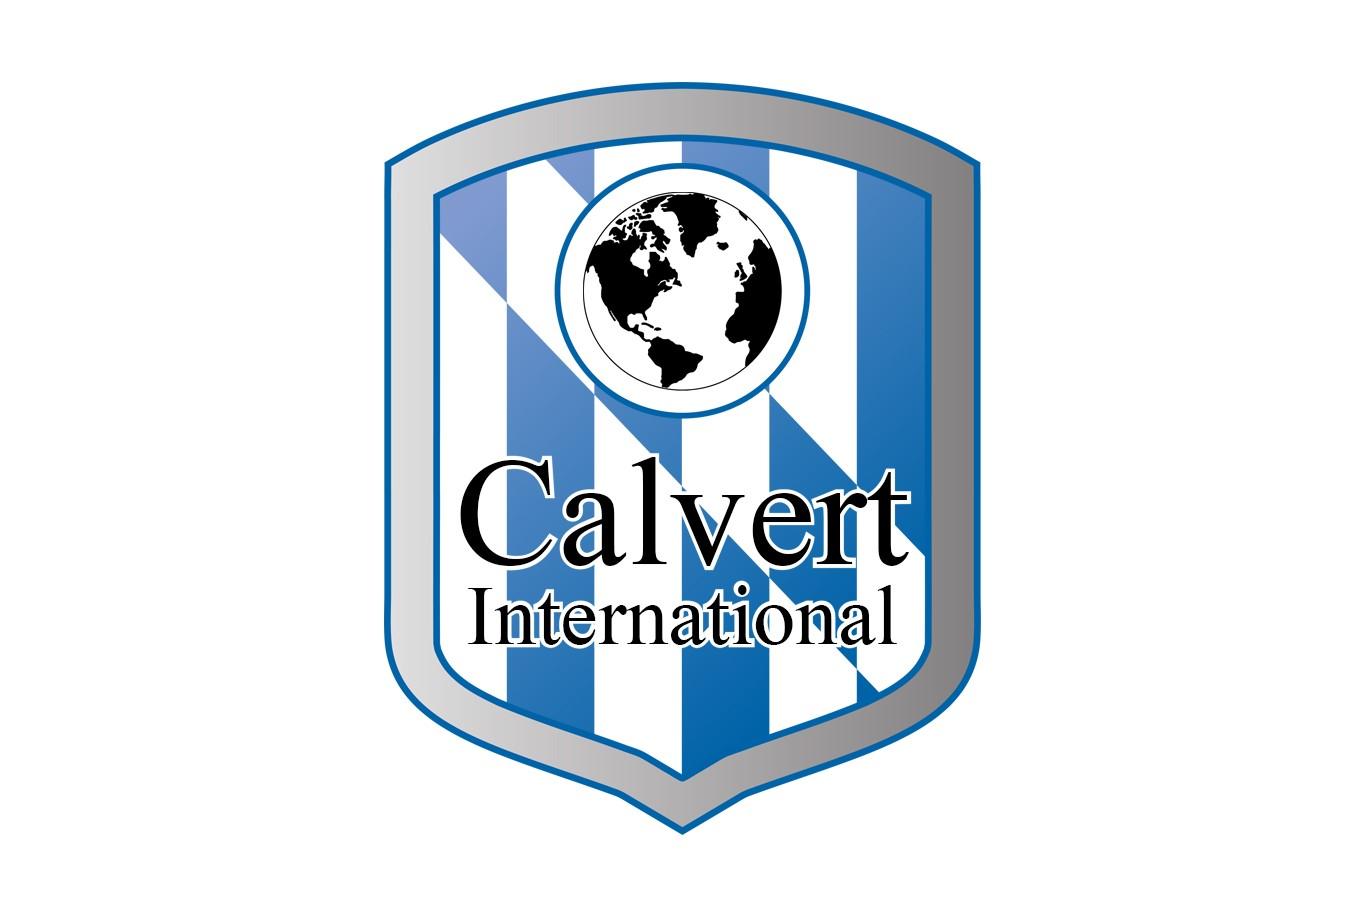 Calvert image.jpg